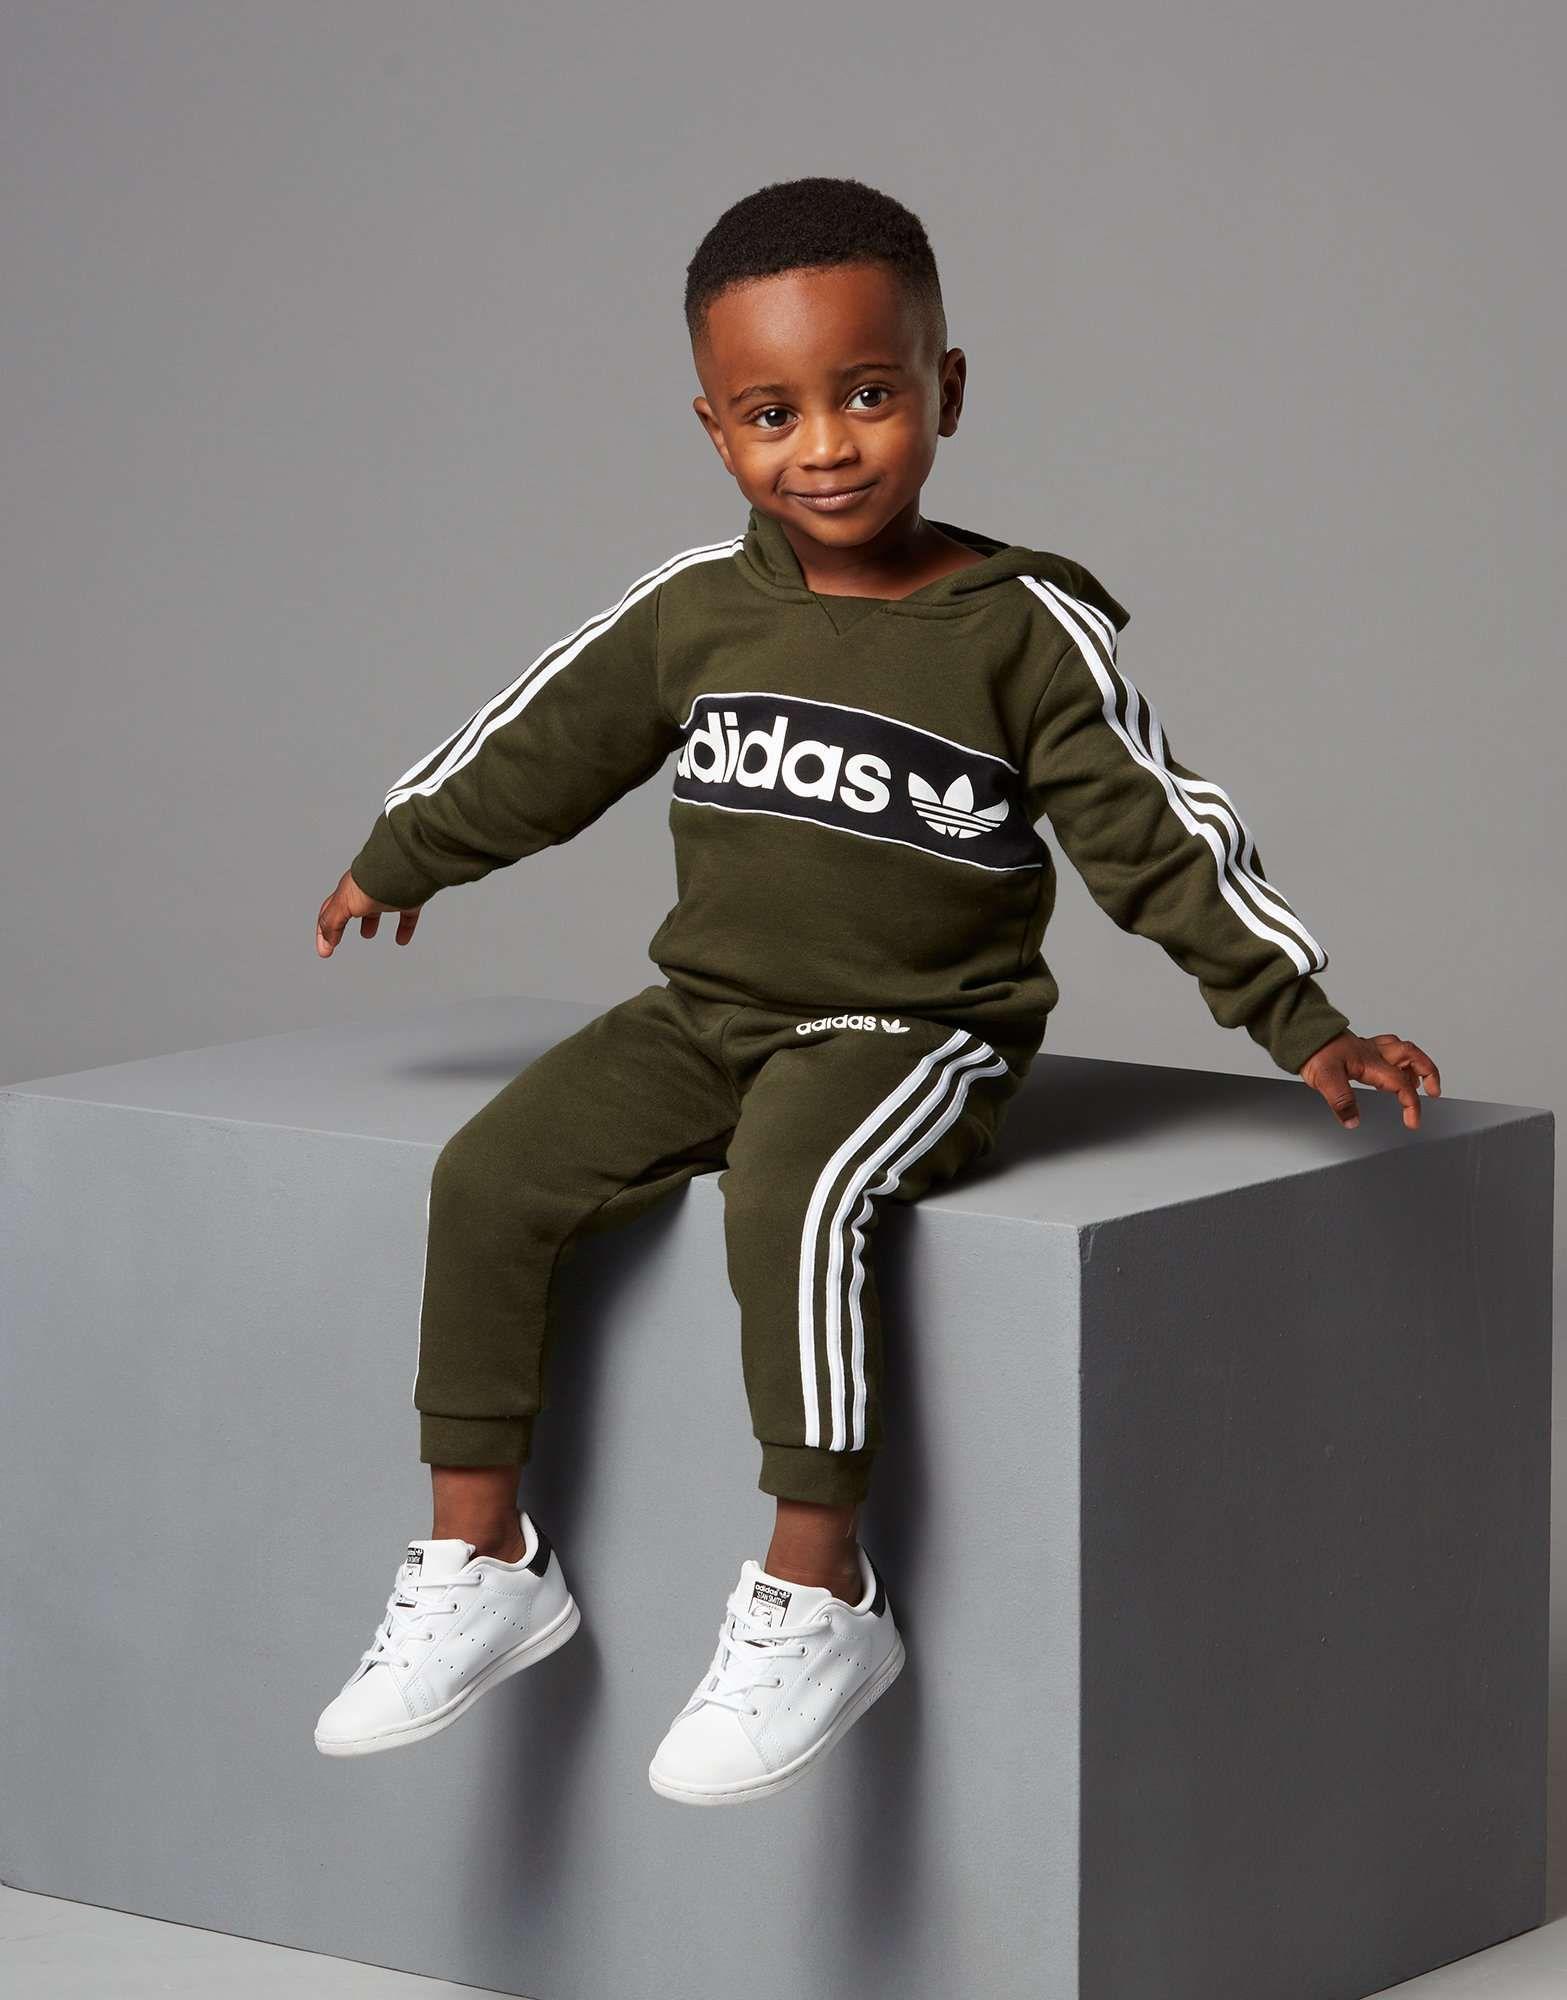 6a497ed68206d adidas Originals Linear Overhead Tracksuit Infant - Shop online for adidas  Originals Linear Overhead Tracksuit Infant with JD Sports